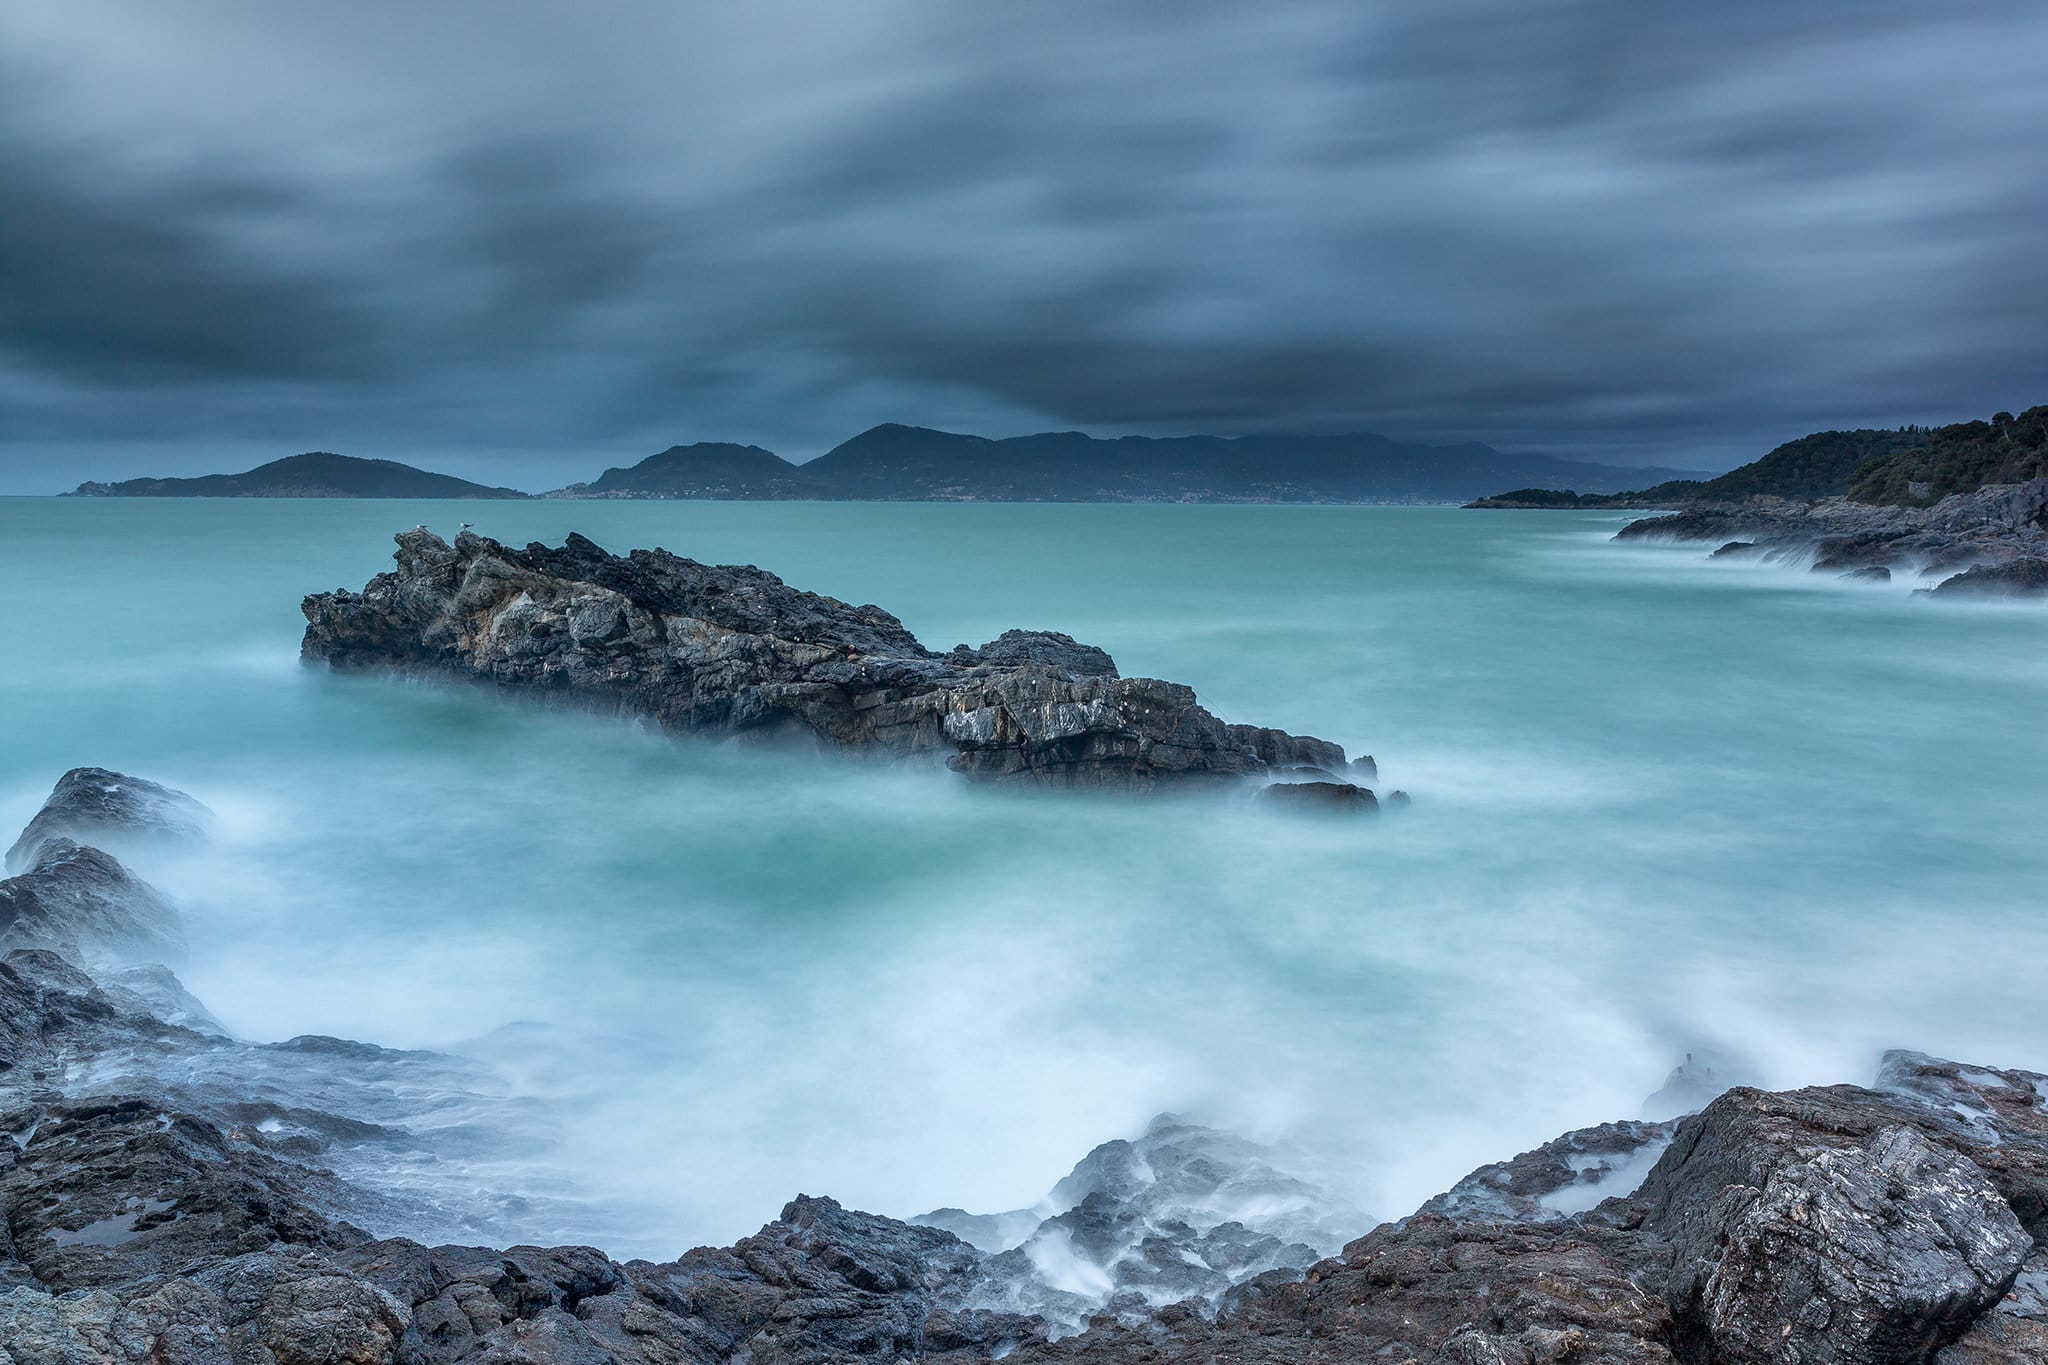 Francesco Gola Seascape Landscape Photography Long Exposure Storm Gulf Tellaro Italy La Spezia Italia